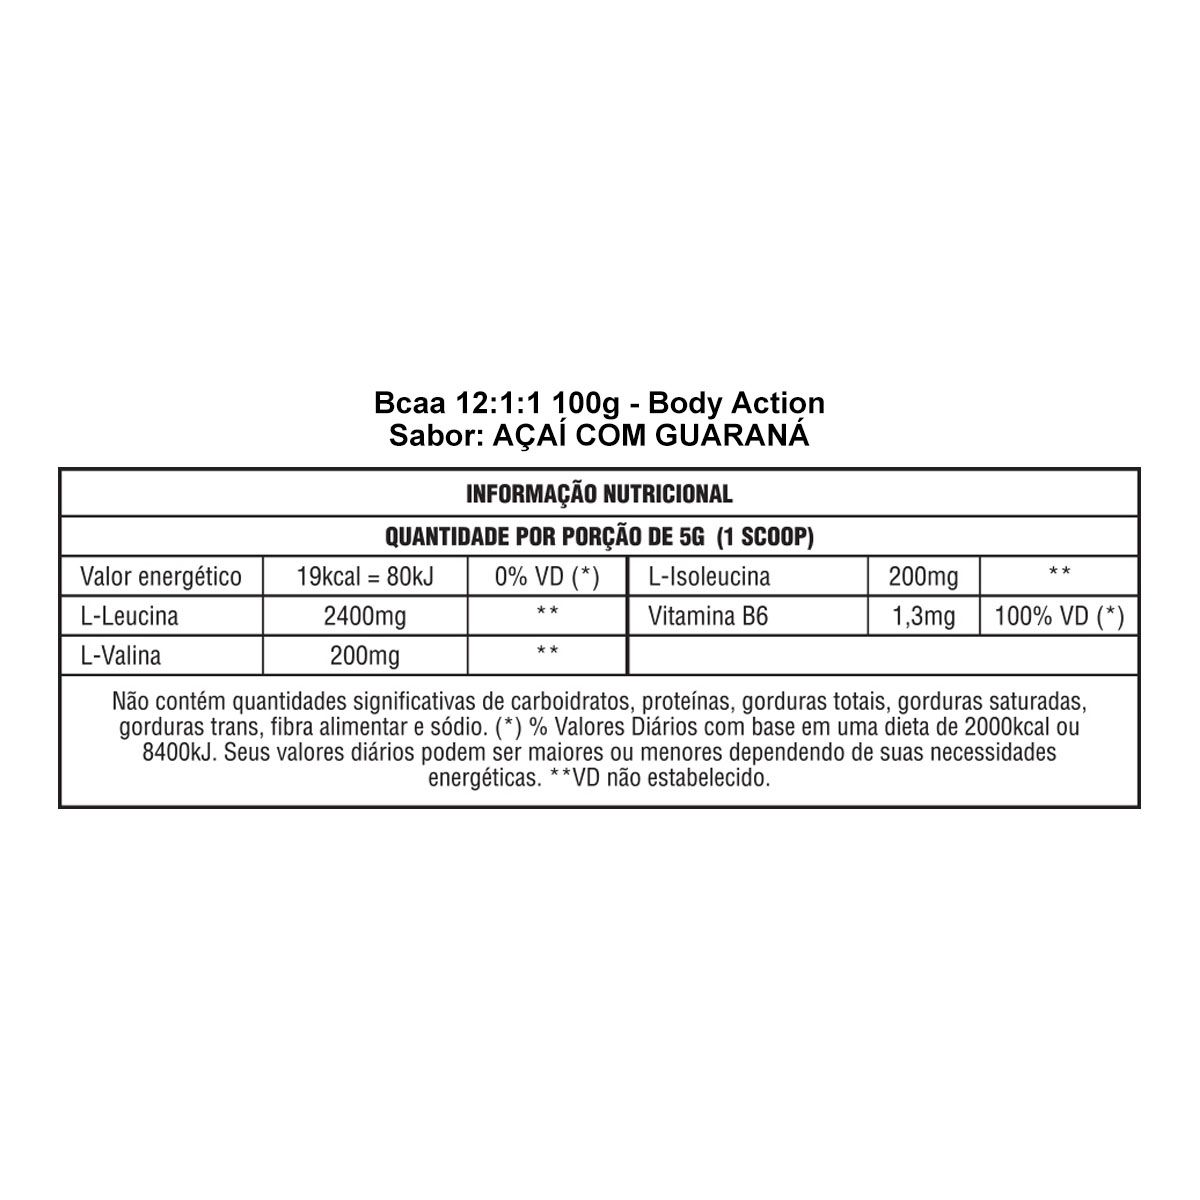 Bcaa 12:1:1 100g - Body Action